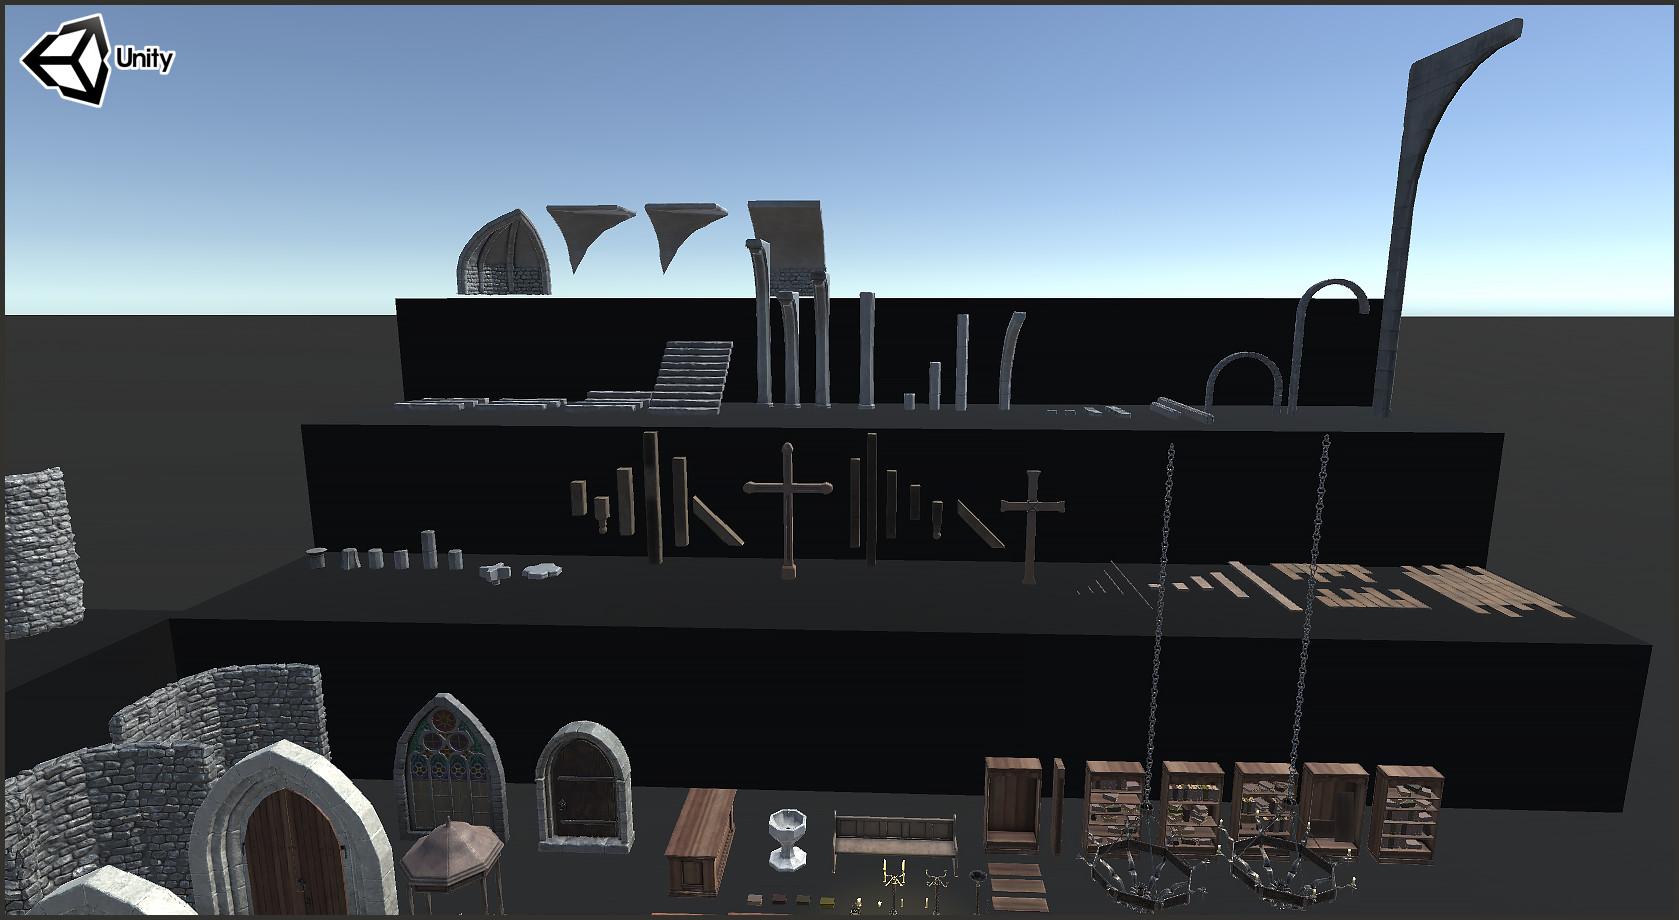 Julian granke screenshots 8